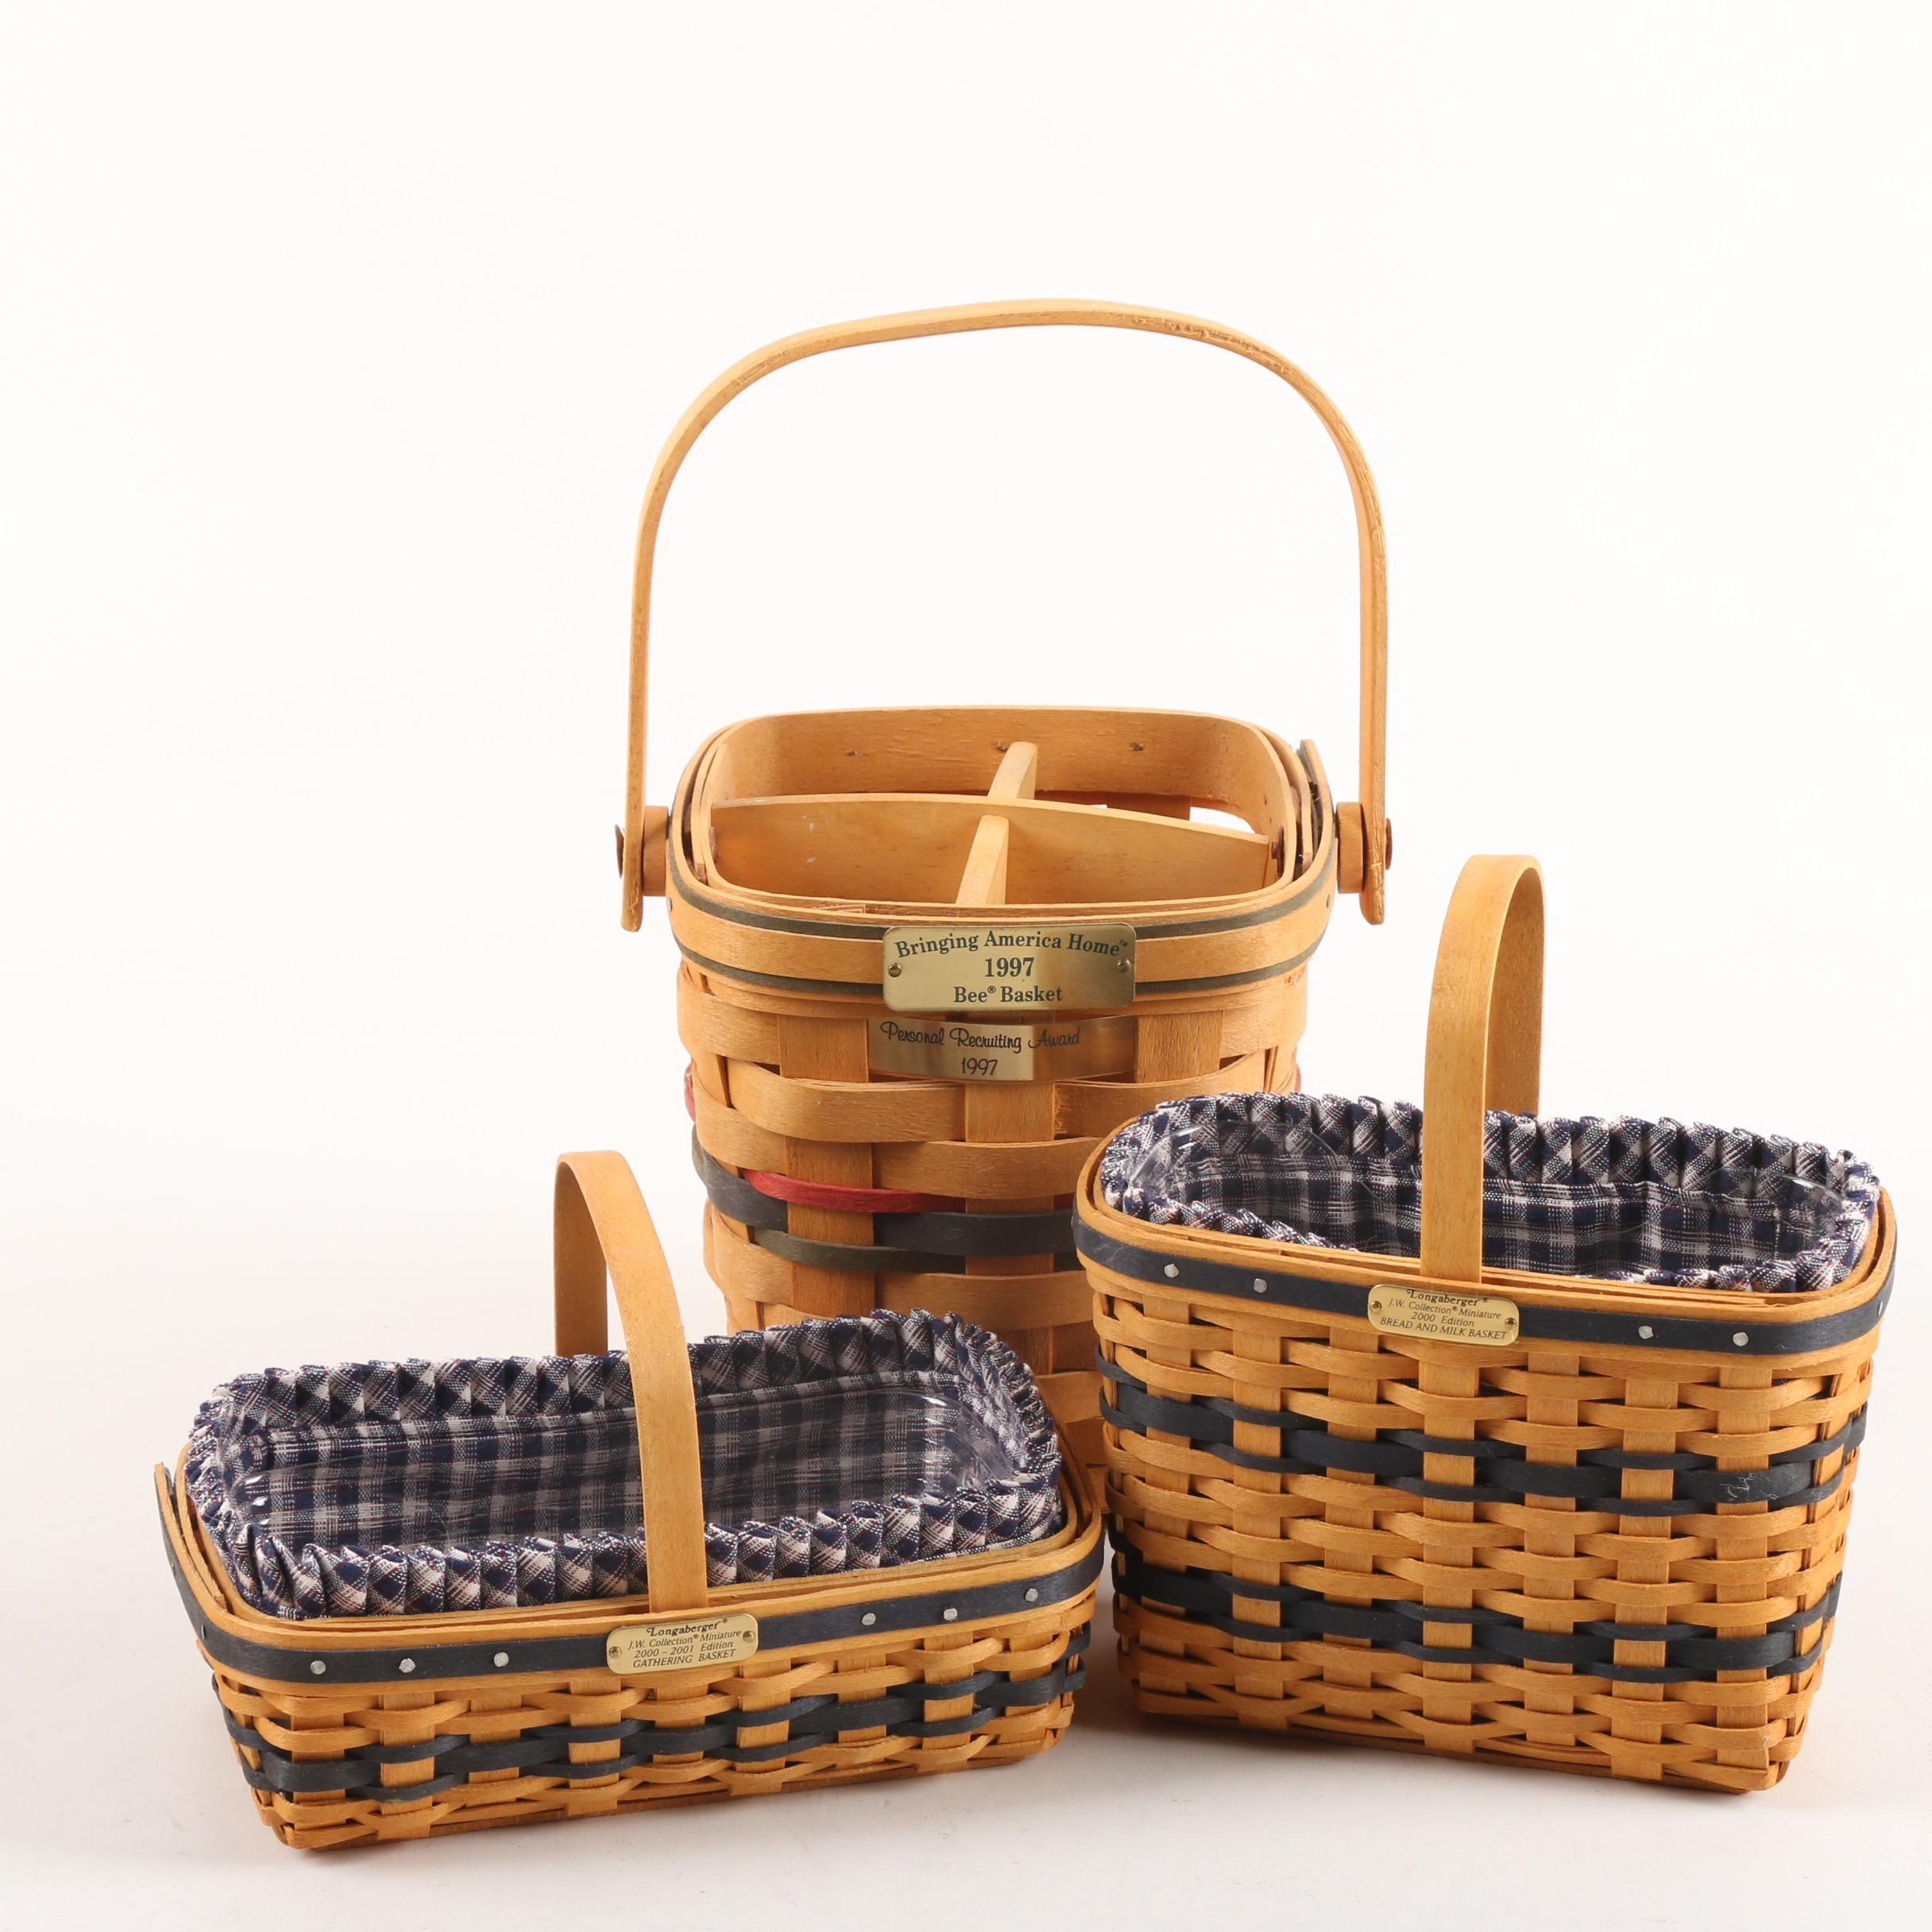 Longaberger Handwoven Baskets including J.W. Collection